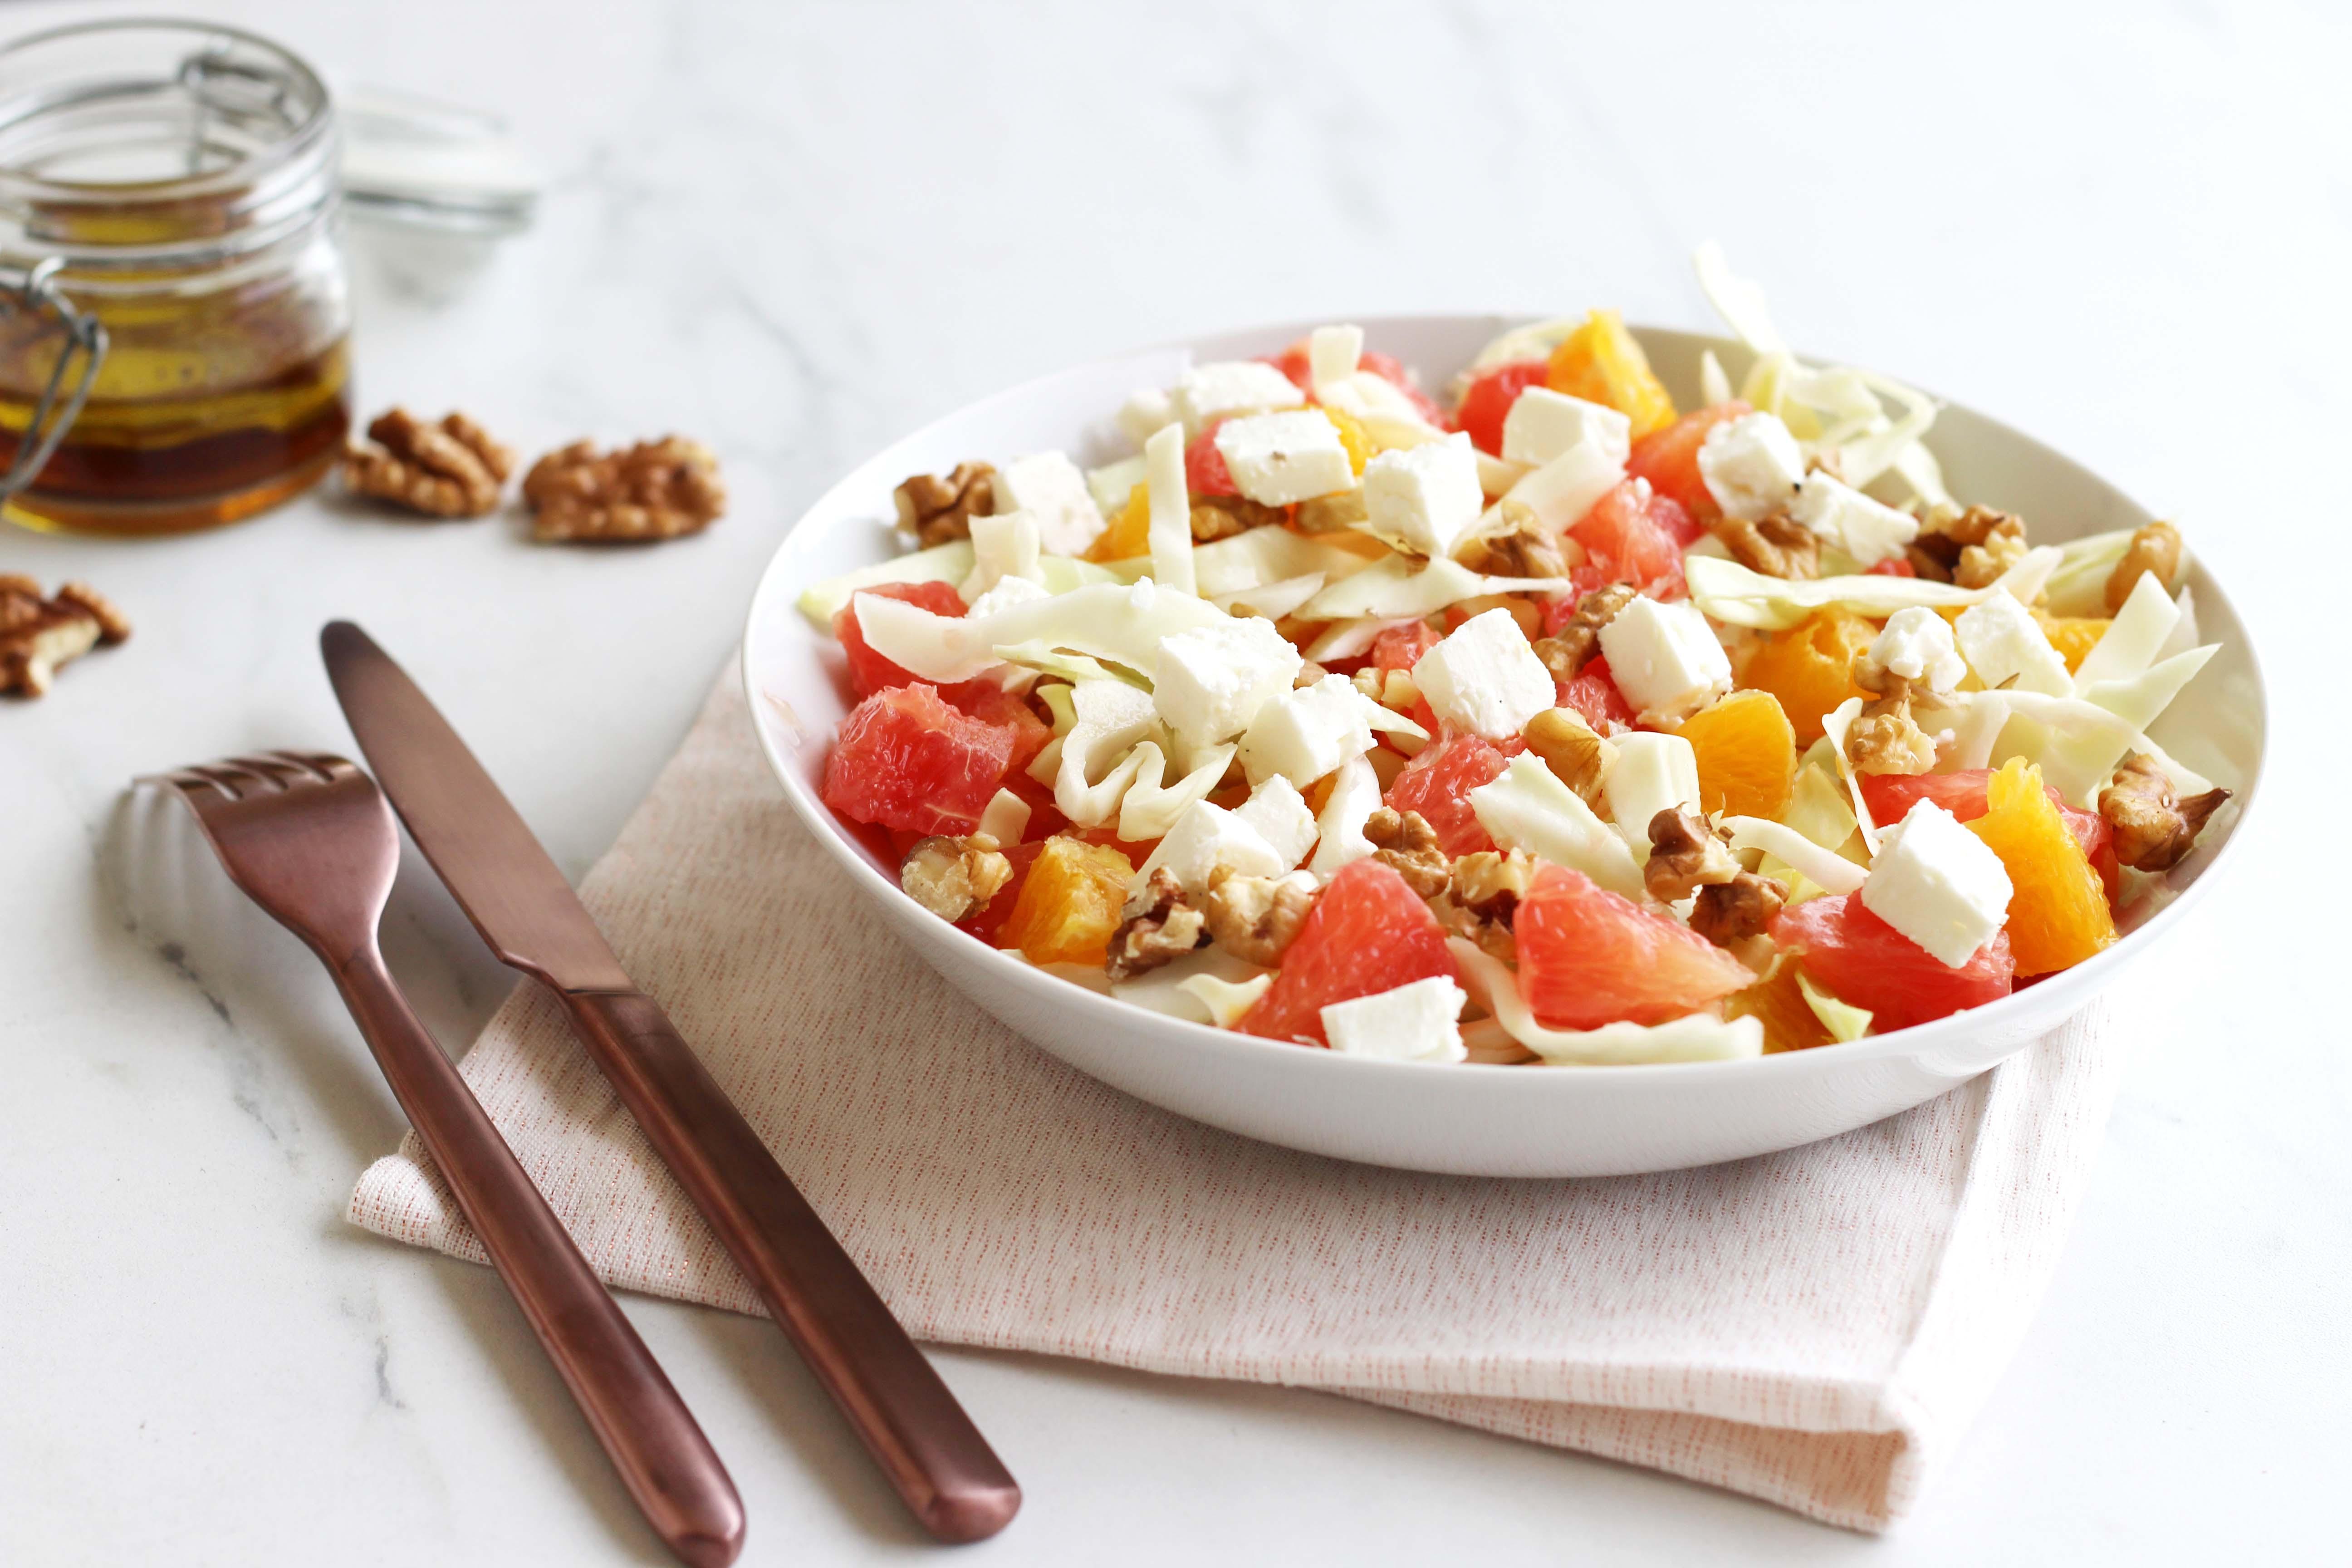 Salade de chou aux agrumes